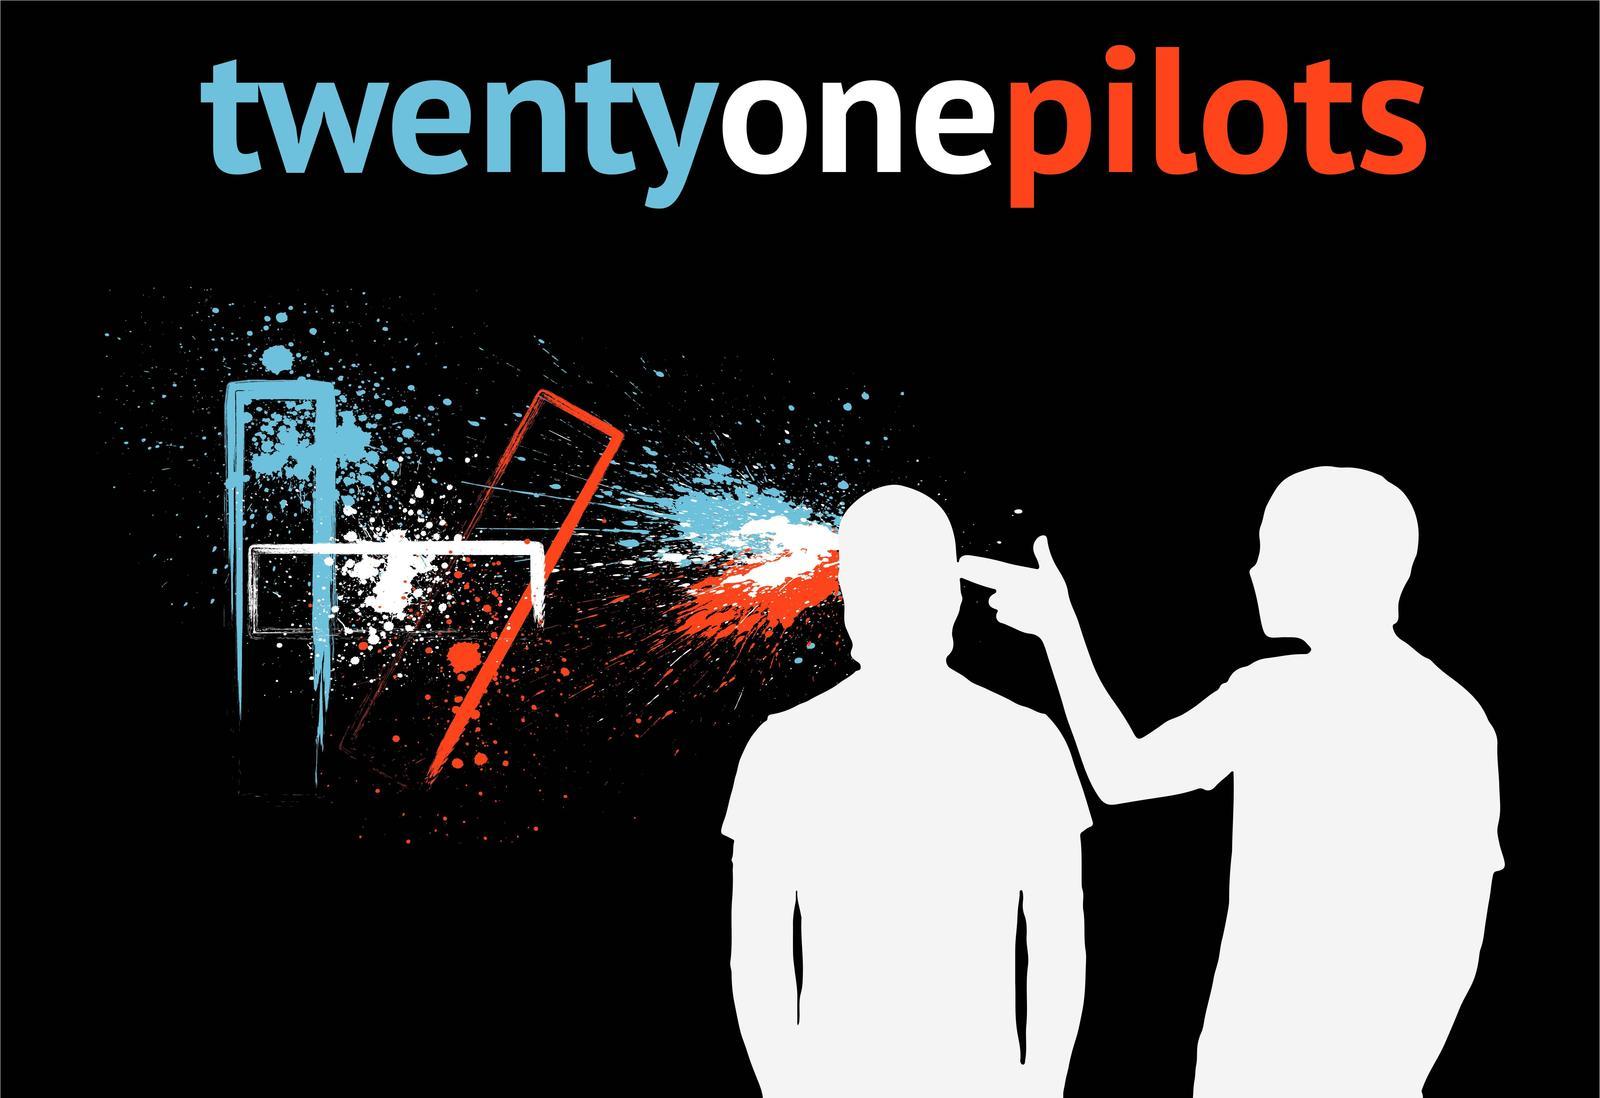 Twenty One Pilots Poster 12x19 Inches 32x49cm Prints